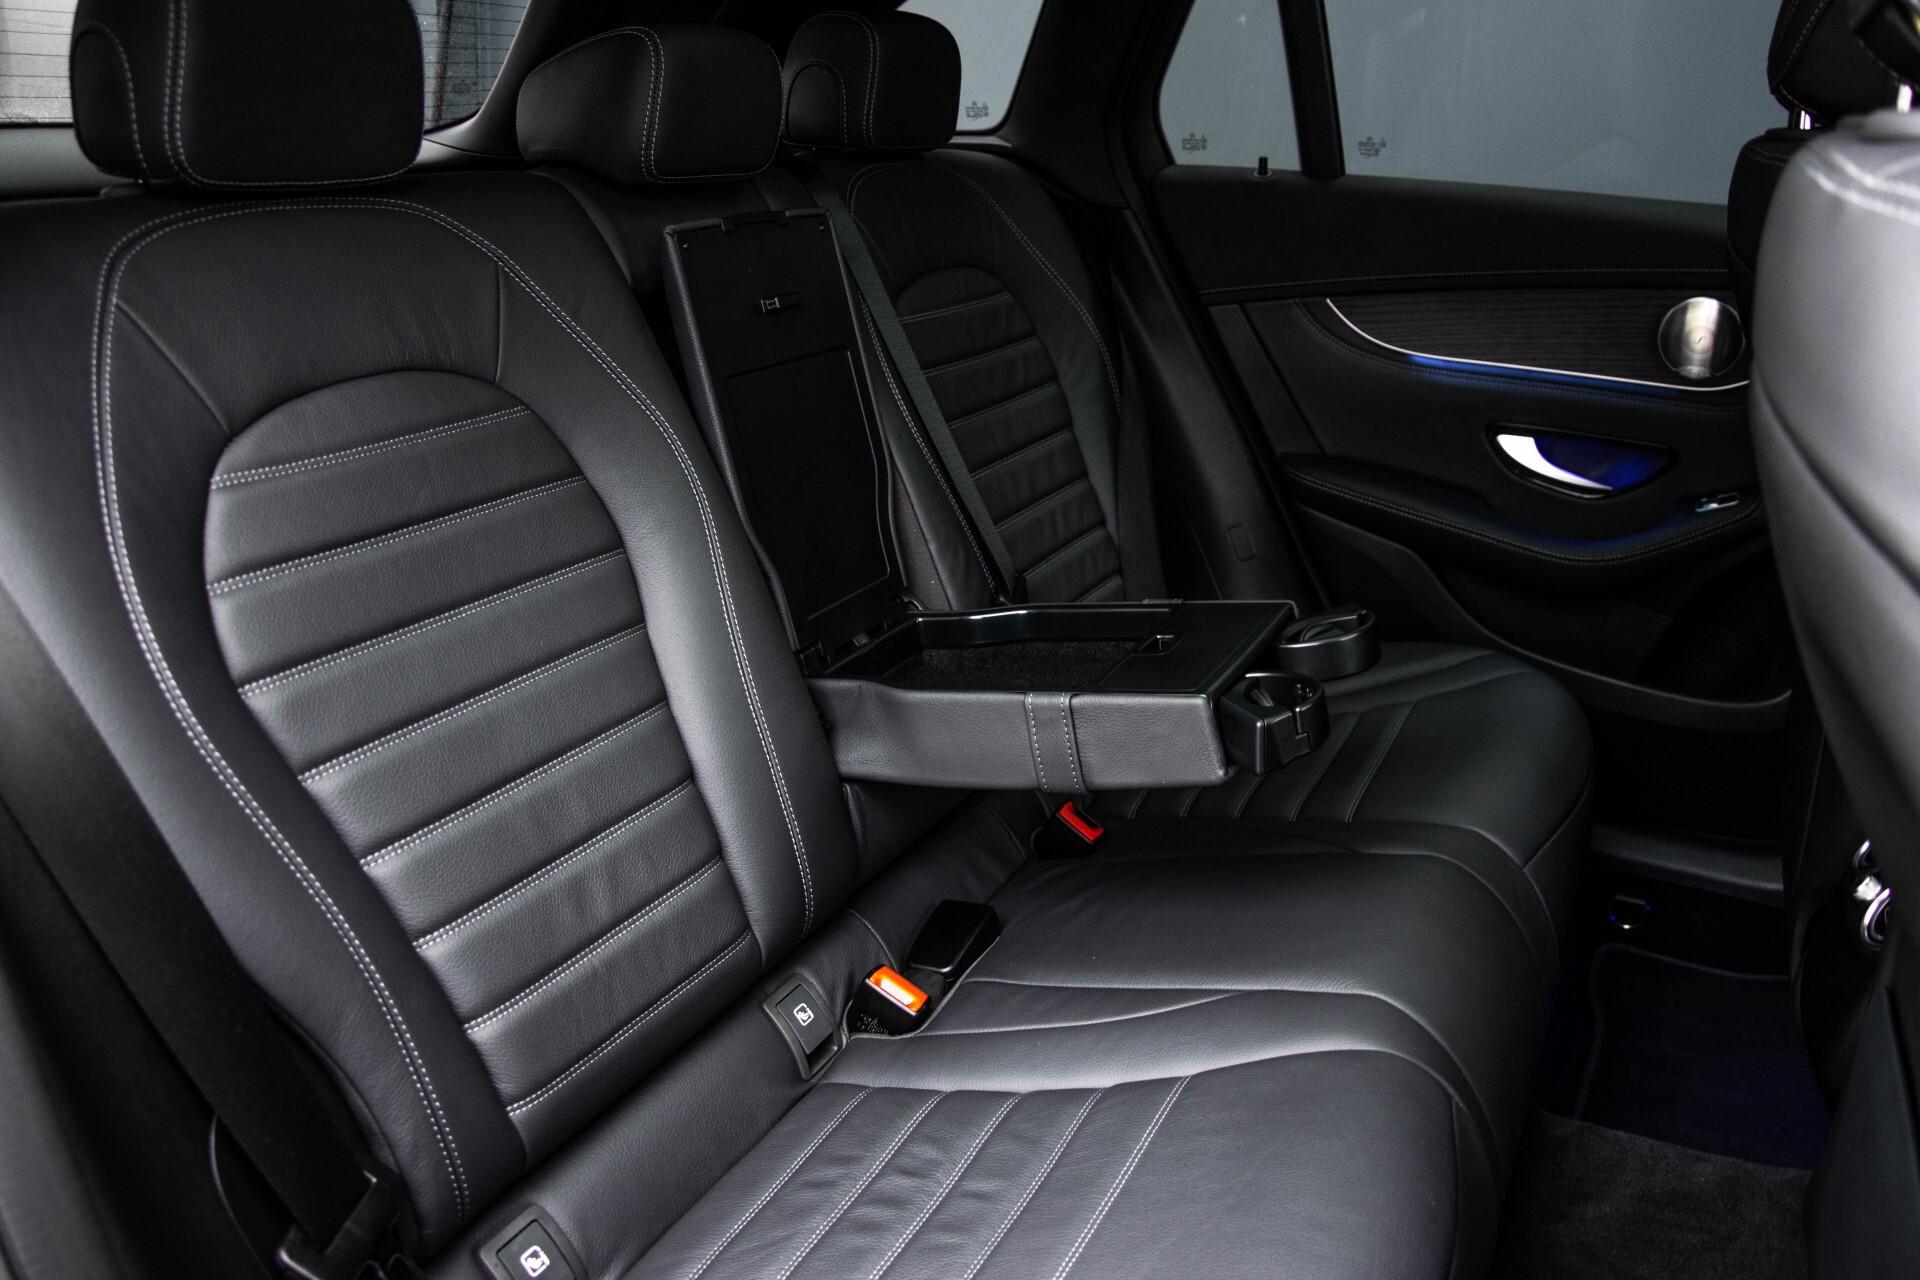 Mercedes-Benz GLC 200 4-M AMG Night/Panorama/Distronic Pro/Burmester/360camera/Exclusive Aut9 Foto 5